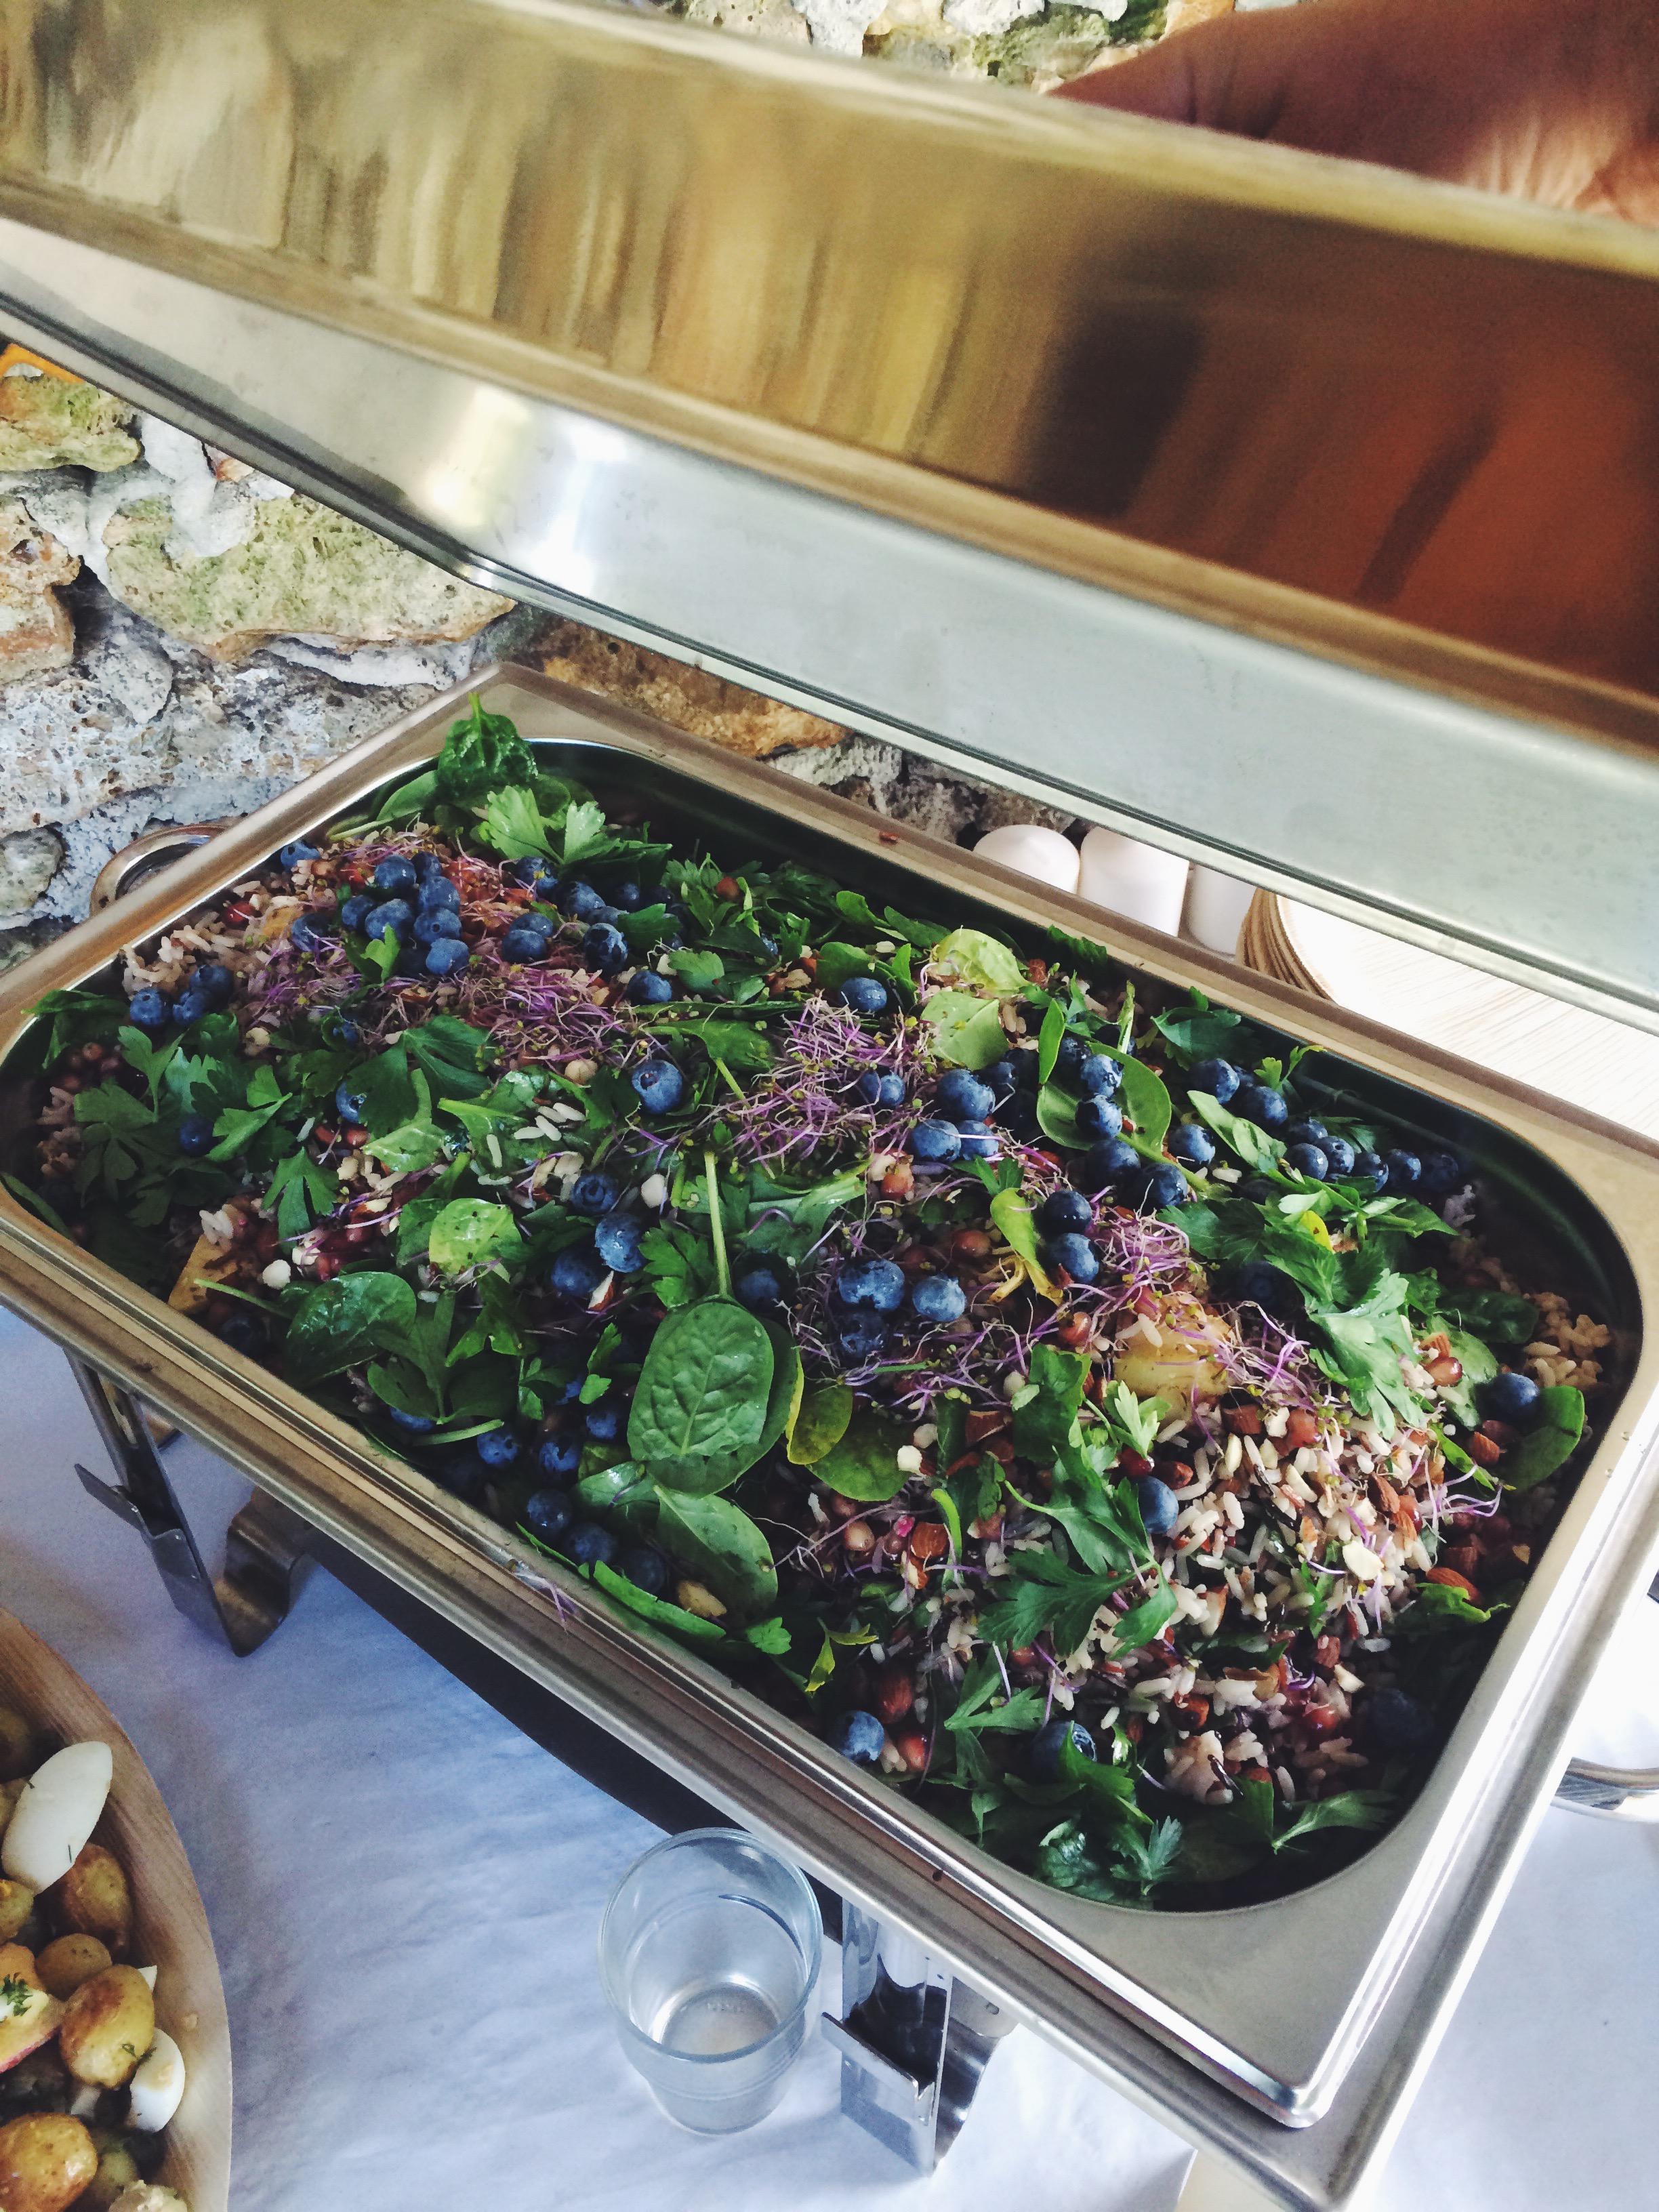 wild rice salad, tamari almonds, blueberries and greens